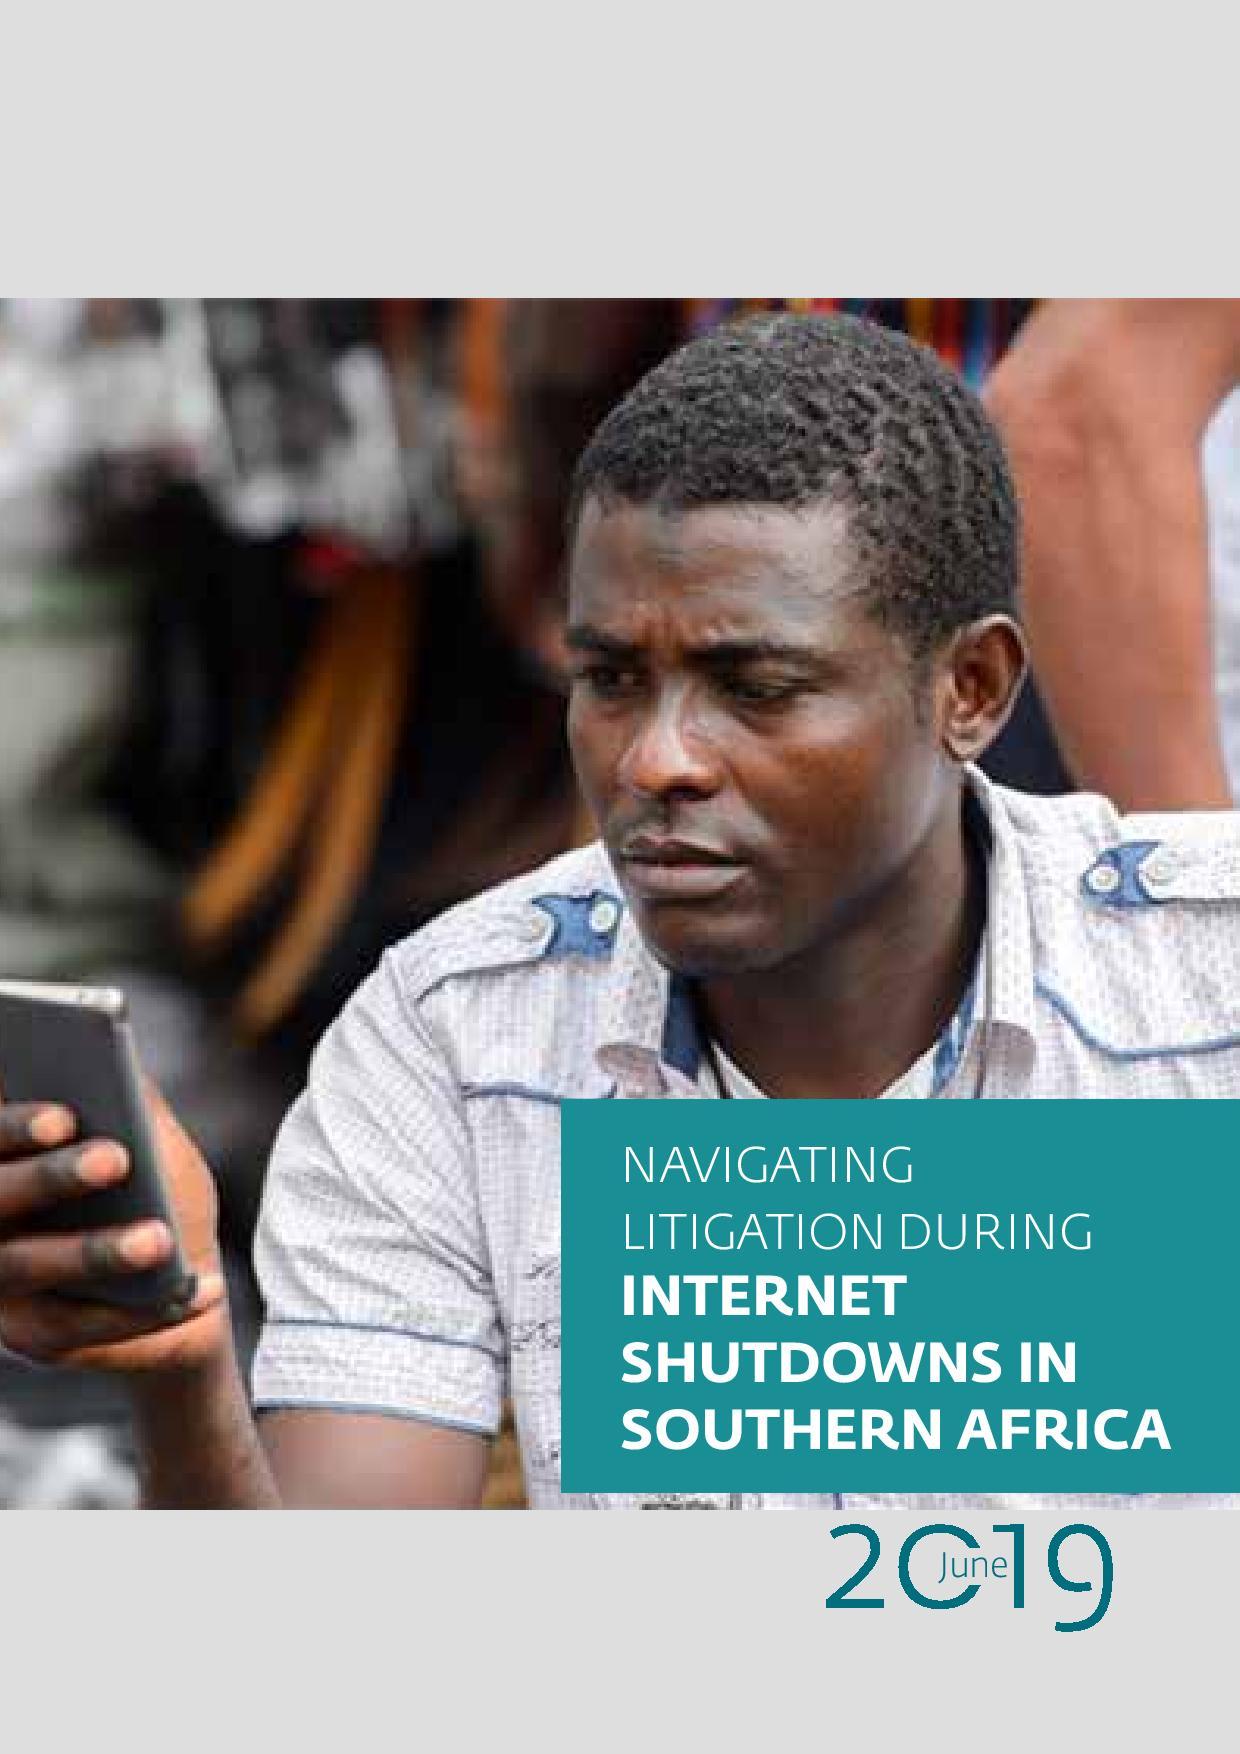 Navigating Litigation During Internet Shutdowns in Southern Africa